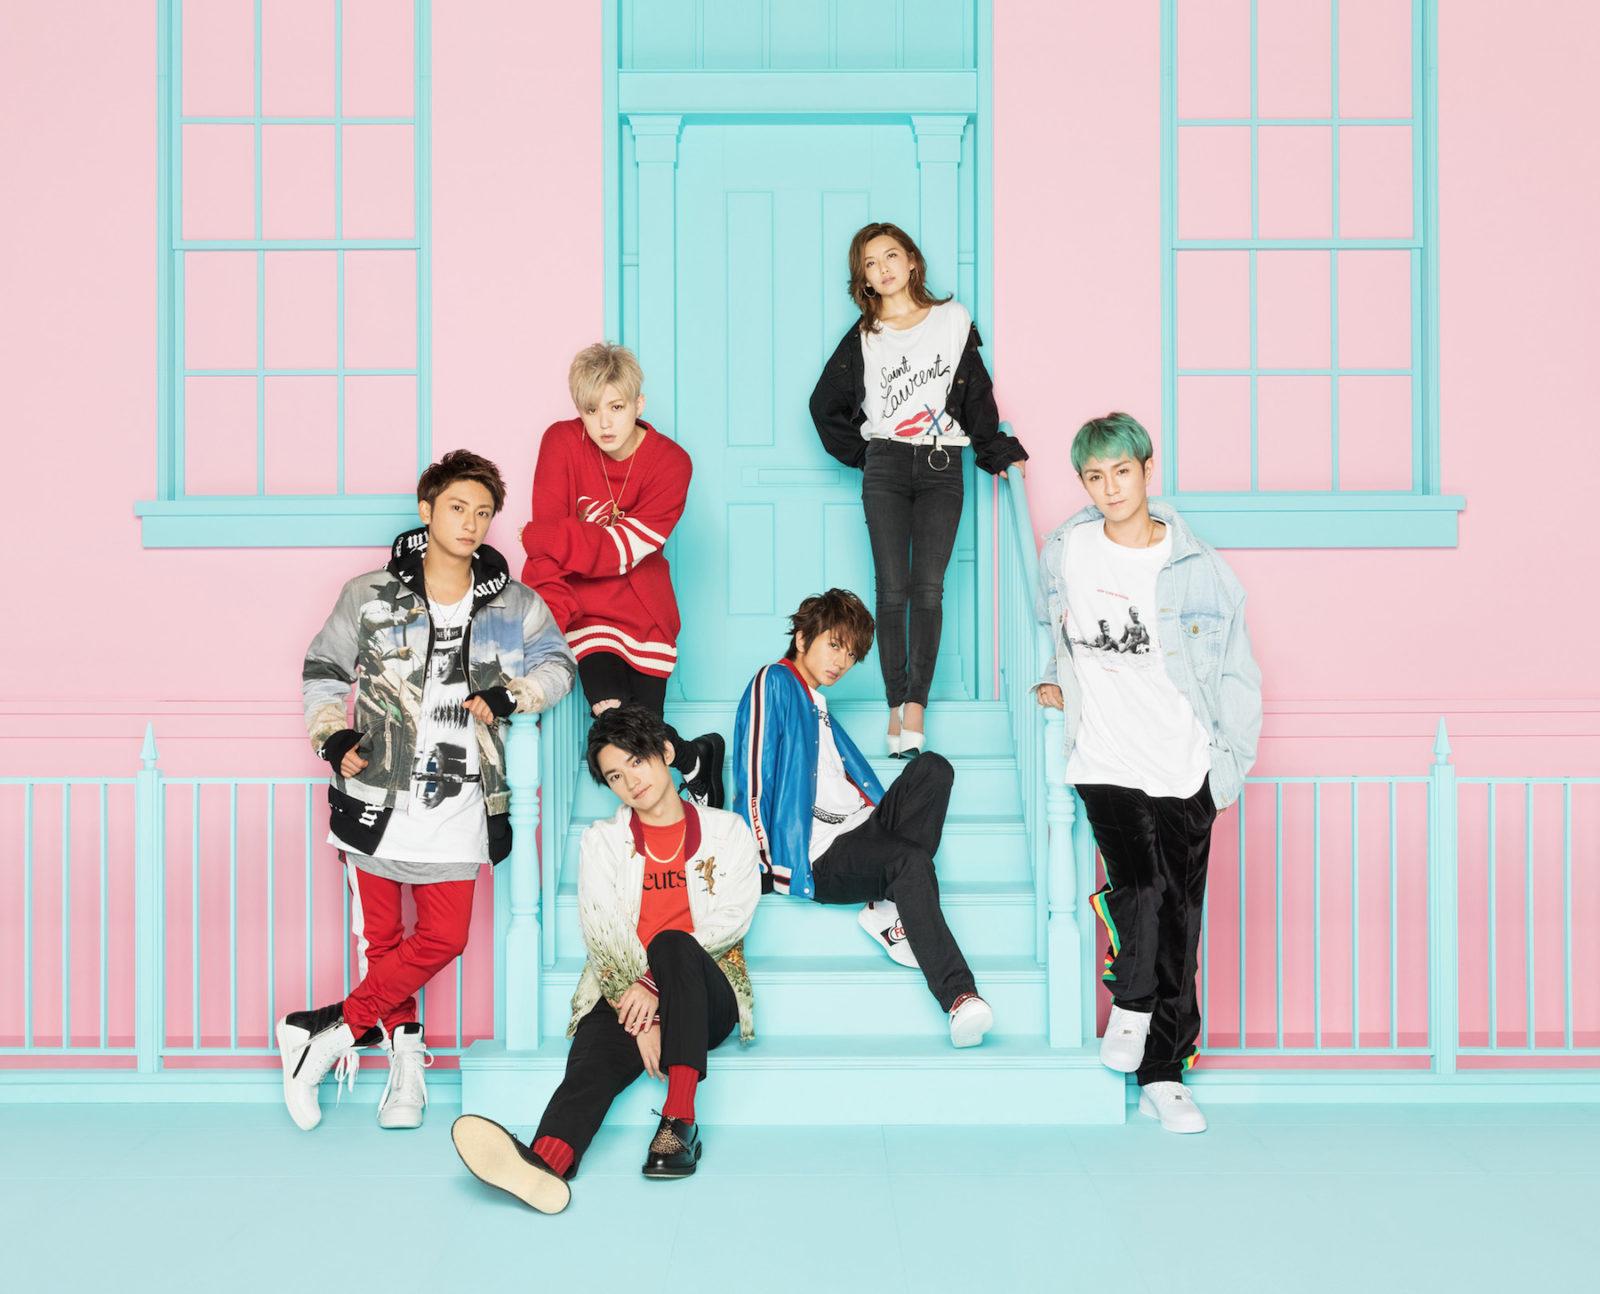 AAA・Shuta Sueyoshiが参加したアルバム『スパイシーチョコレート BEST OF LOVE SONGS』がリリースサムネイル画像!